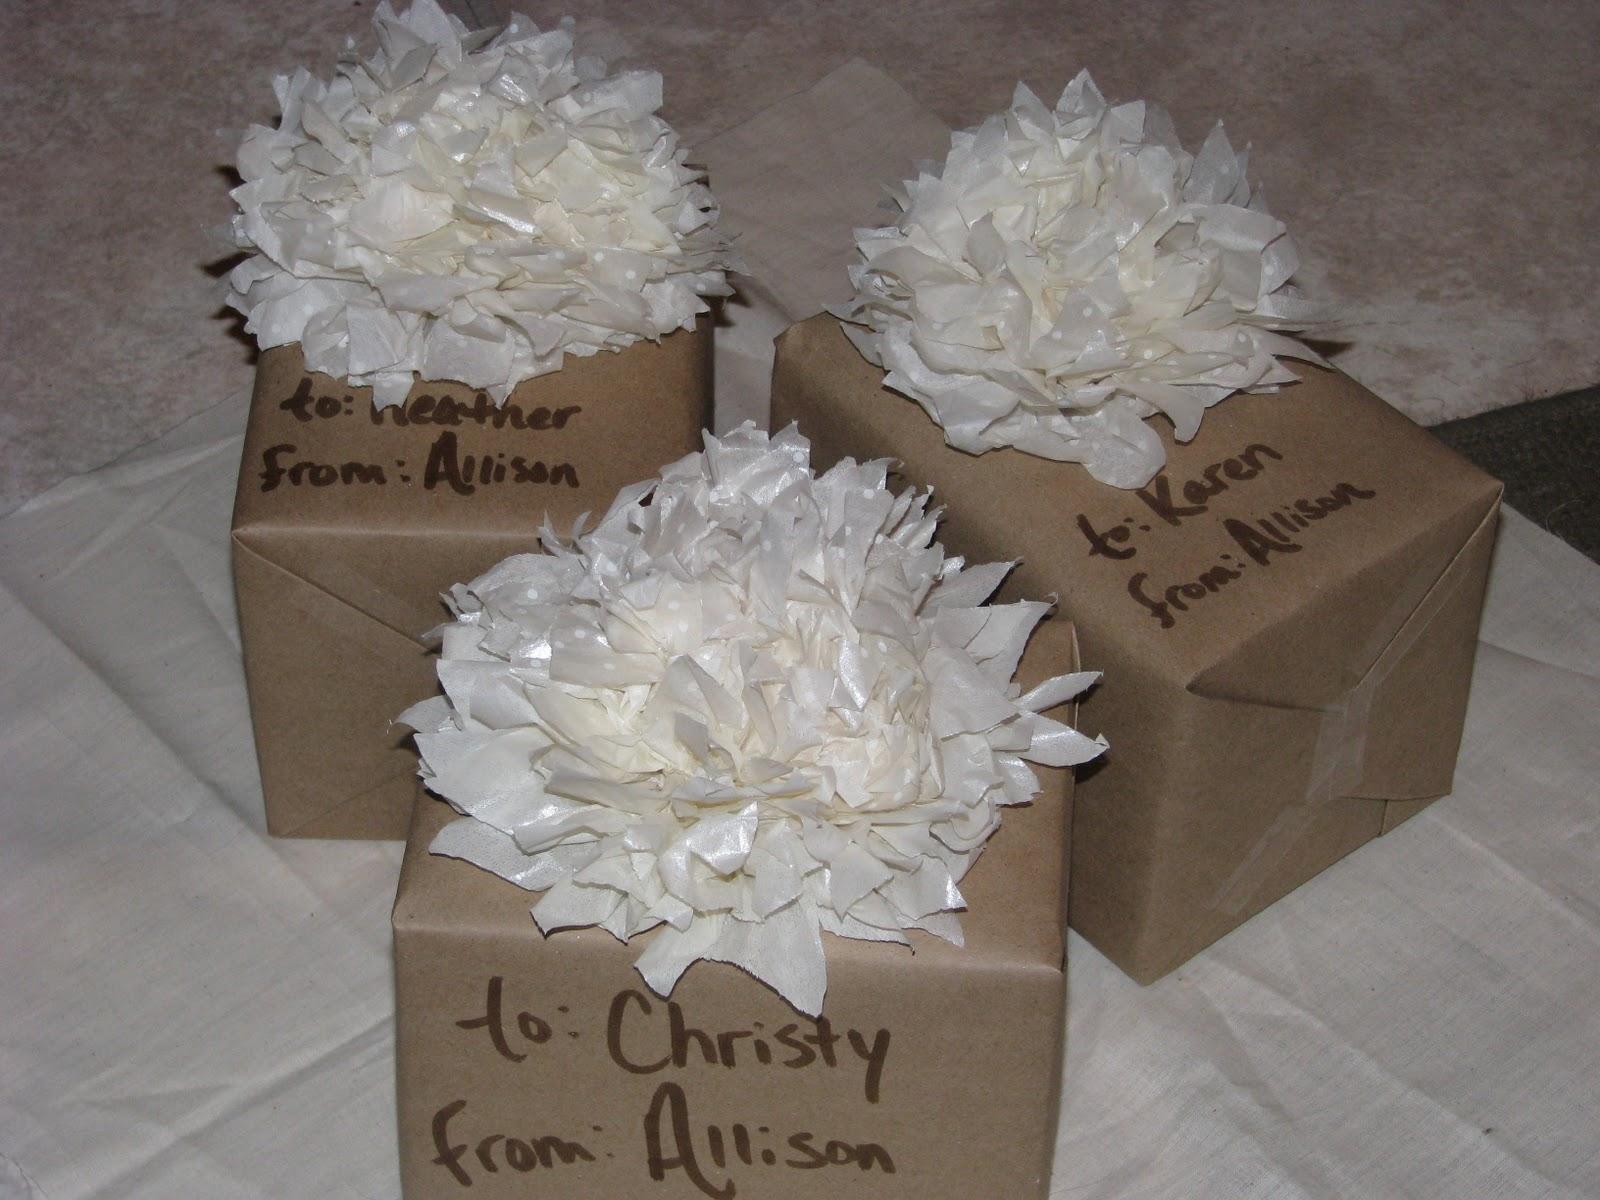 David And Al's Wedding: Hostess Gifts